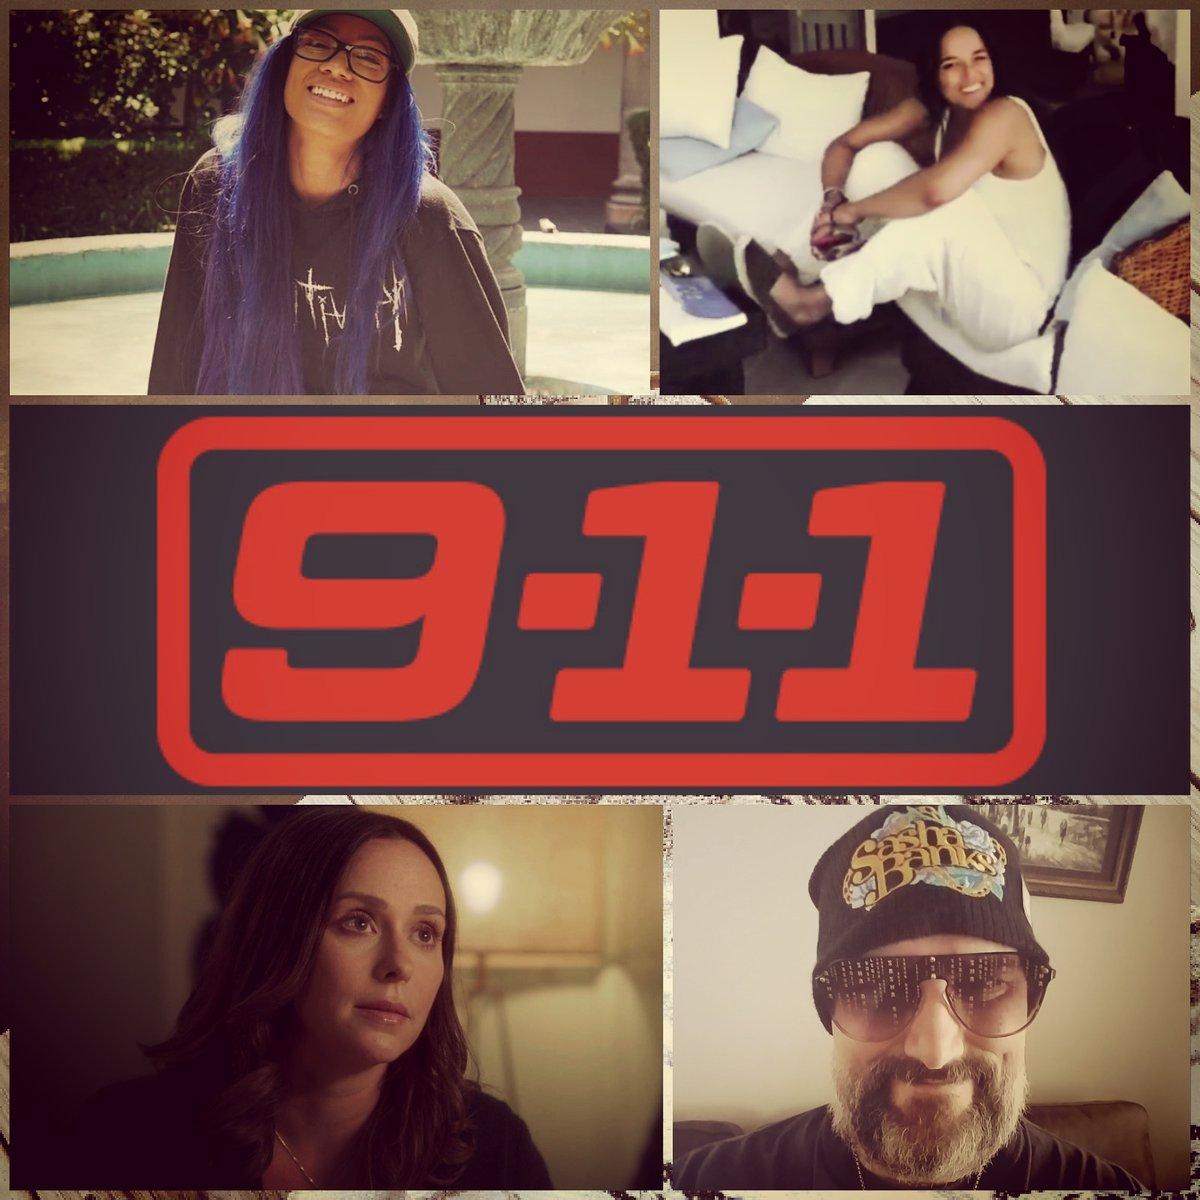 Next Watchin #911OnFox Season Premiere y'all #Happy #Selfie #JenniferLoveJewitt #SashaBanks #SashaKrew #LegitBoss #MichelleRodrguez #mrodfamily #mrodlover 😊😍🔥🔥💙💜❤